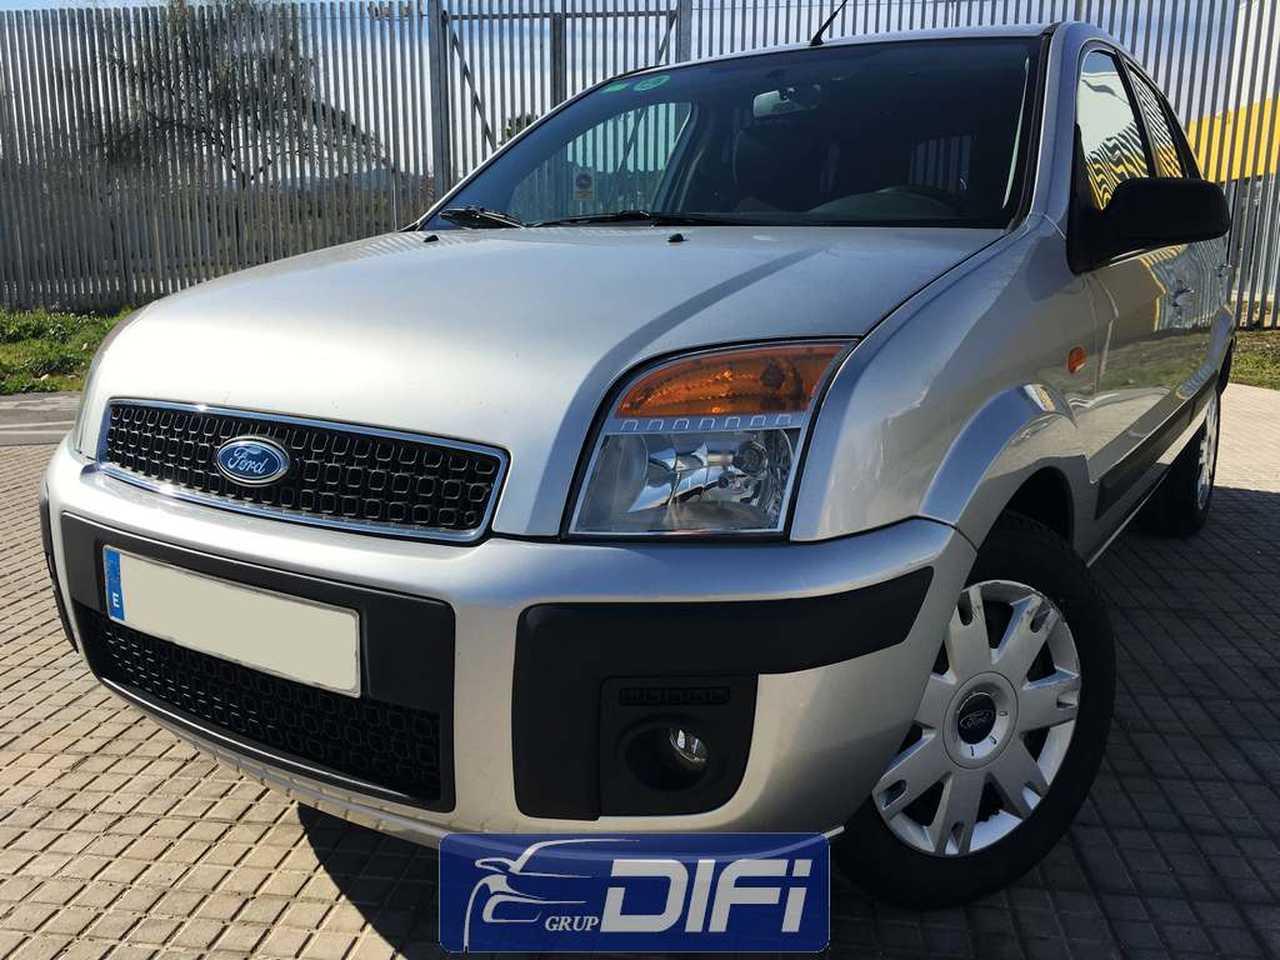 Ford Fusion 1.6 16v Elegance   - Foto 1